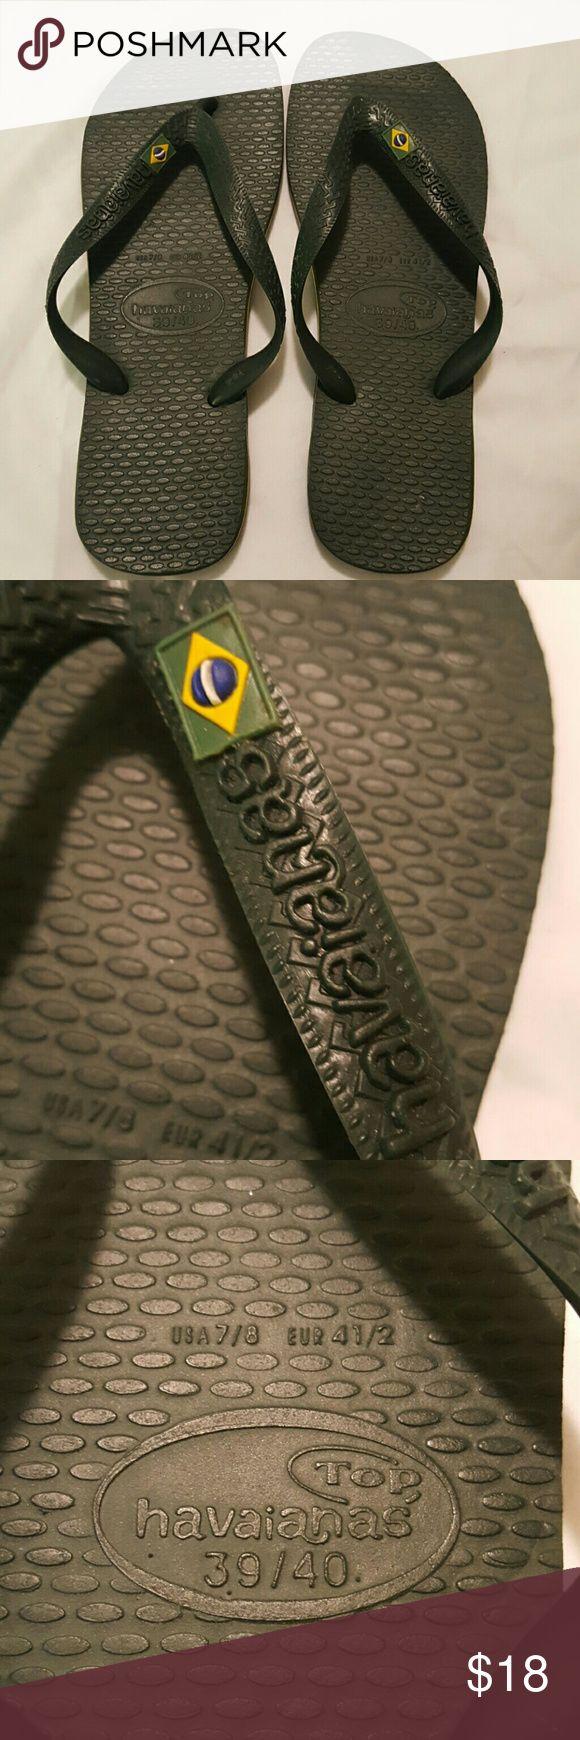 HAVAIANAS Brasil  flip flops Made in Brazil size 7/8 Havaianas Shoes Sandals & Flip-Flops